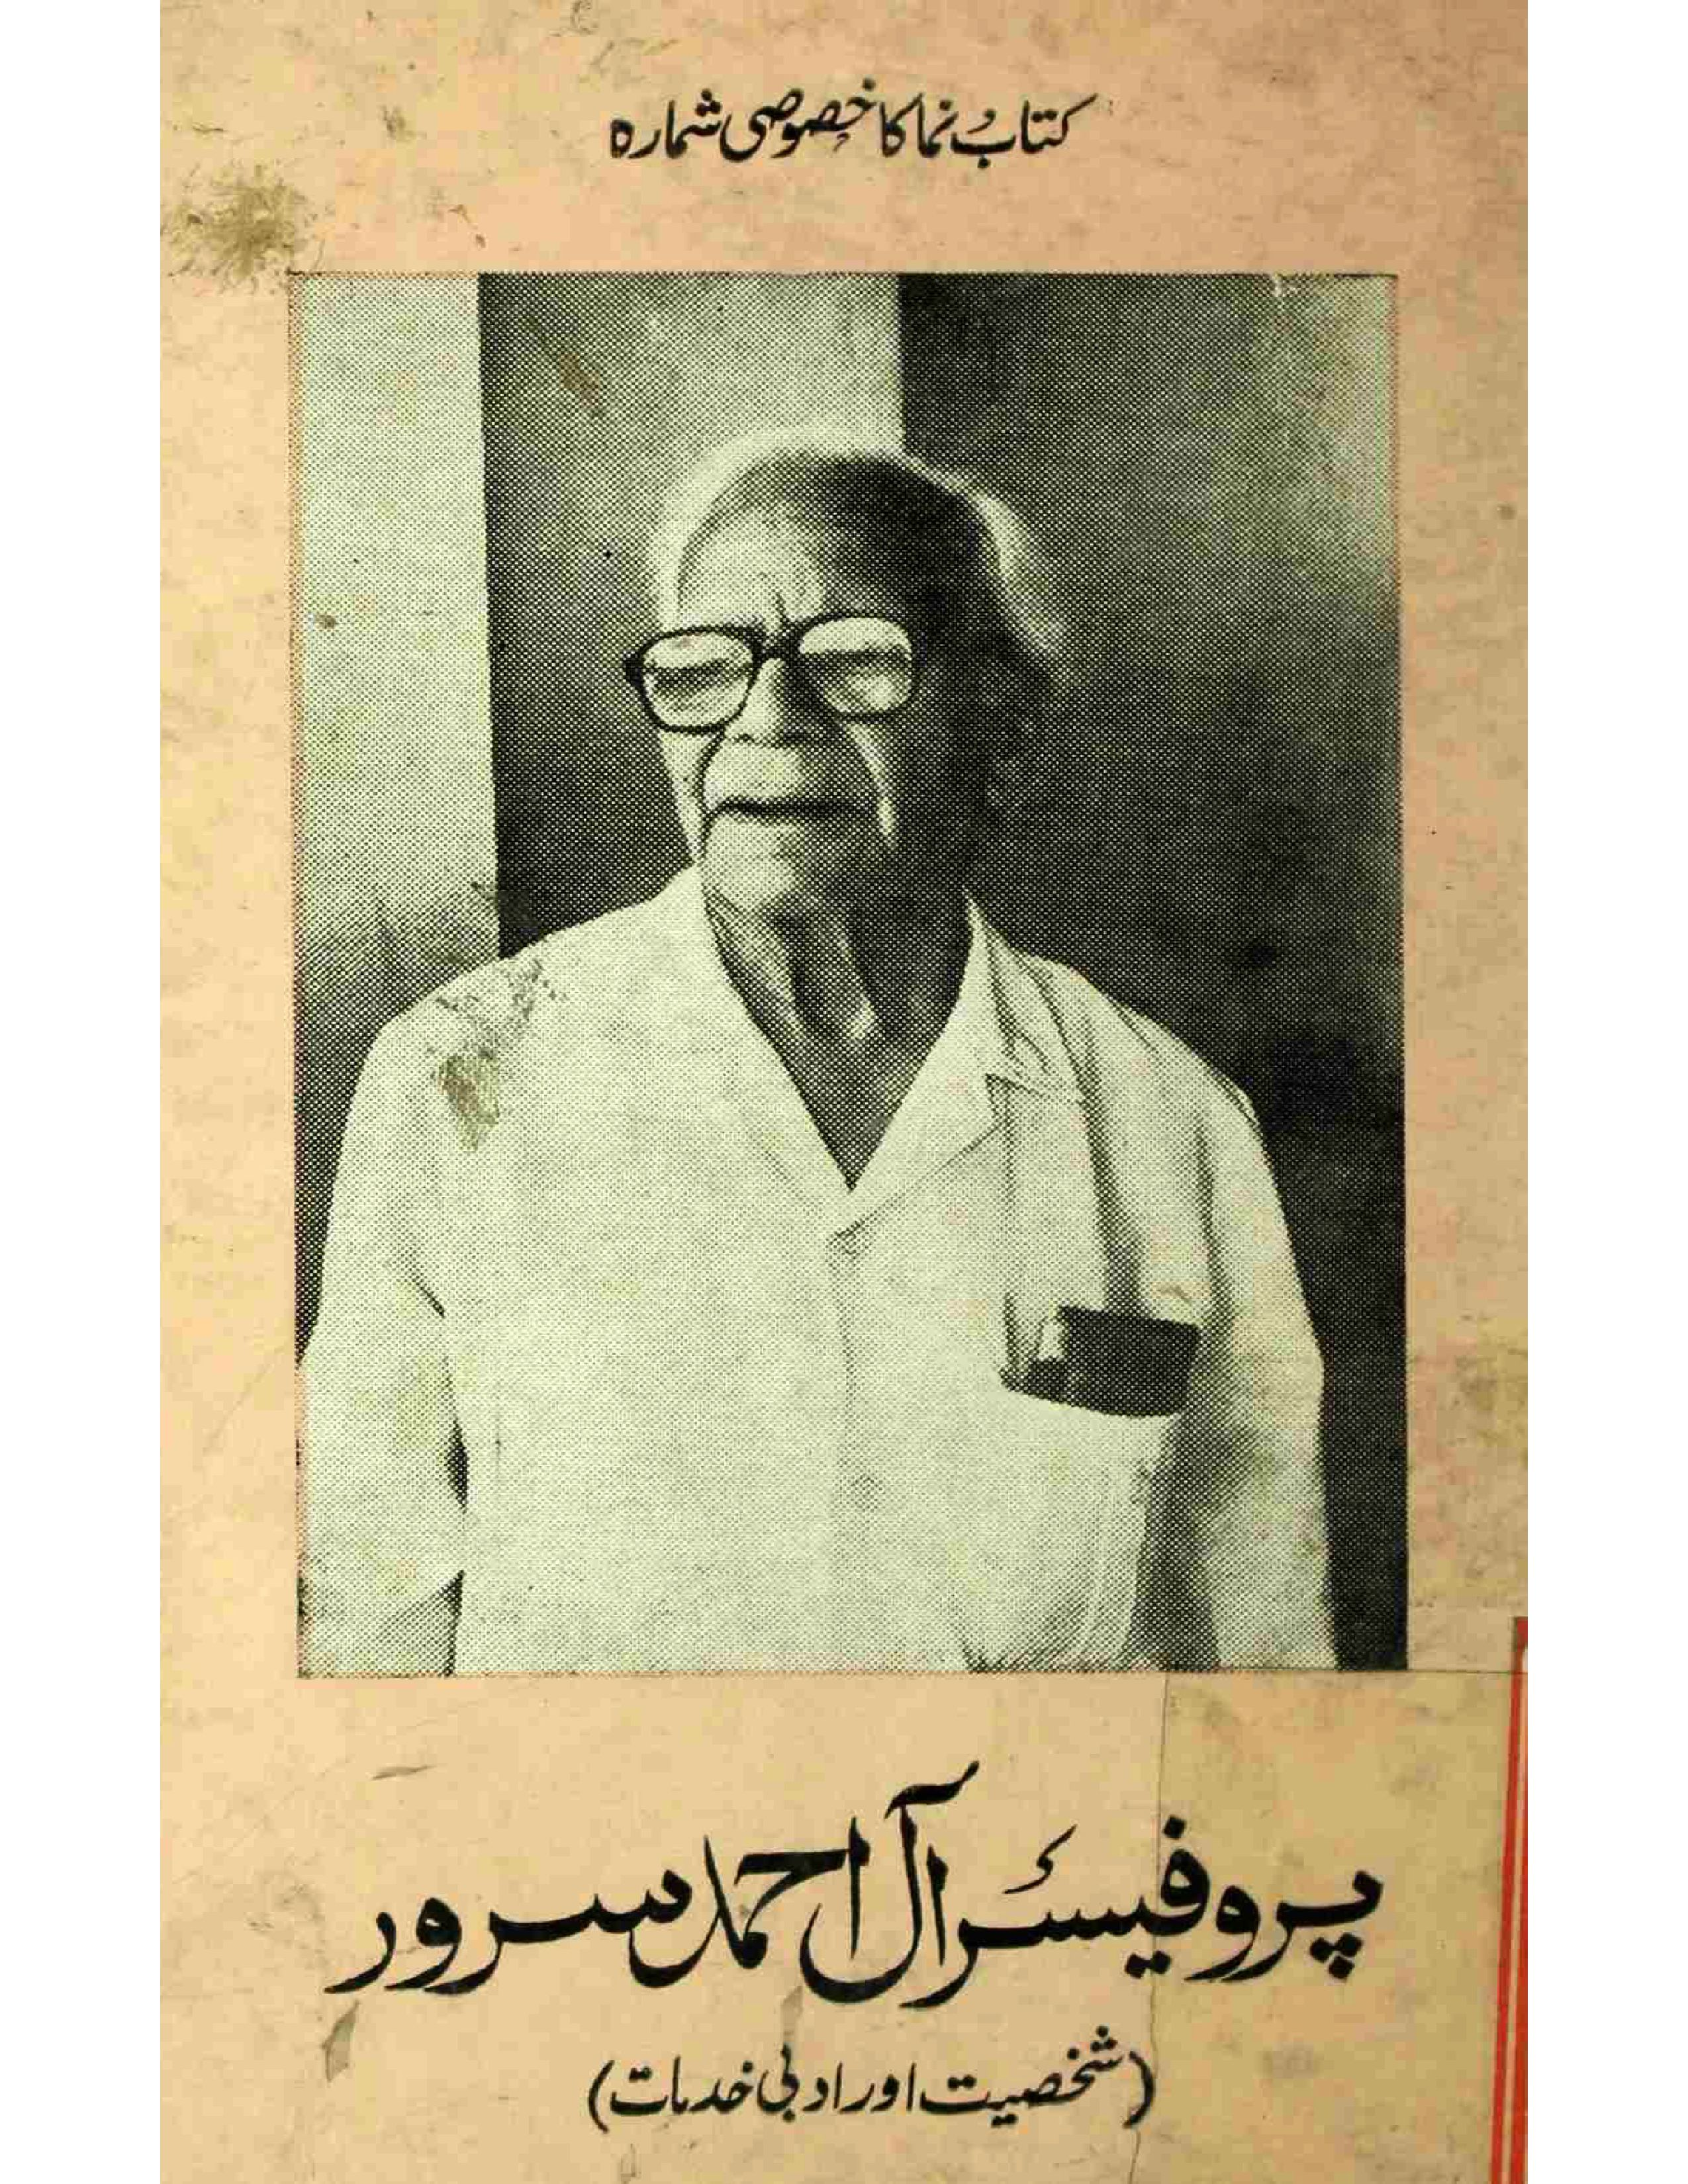 Professor Aale Ahmad Suroor     Shakhsiyat Aur Adabi Khidmat